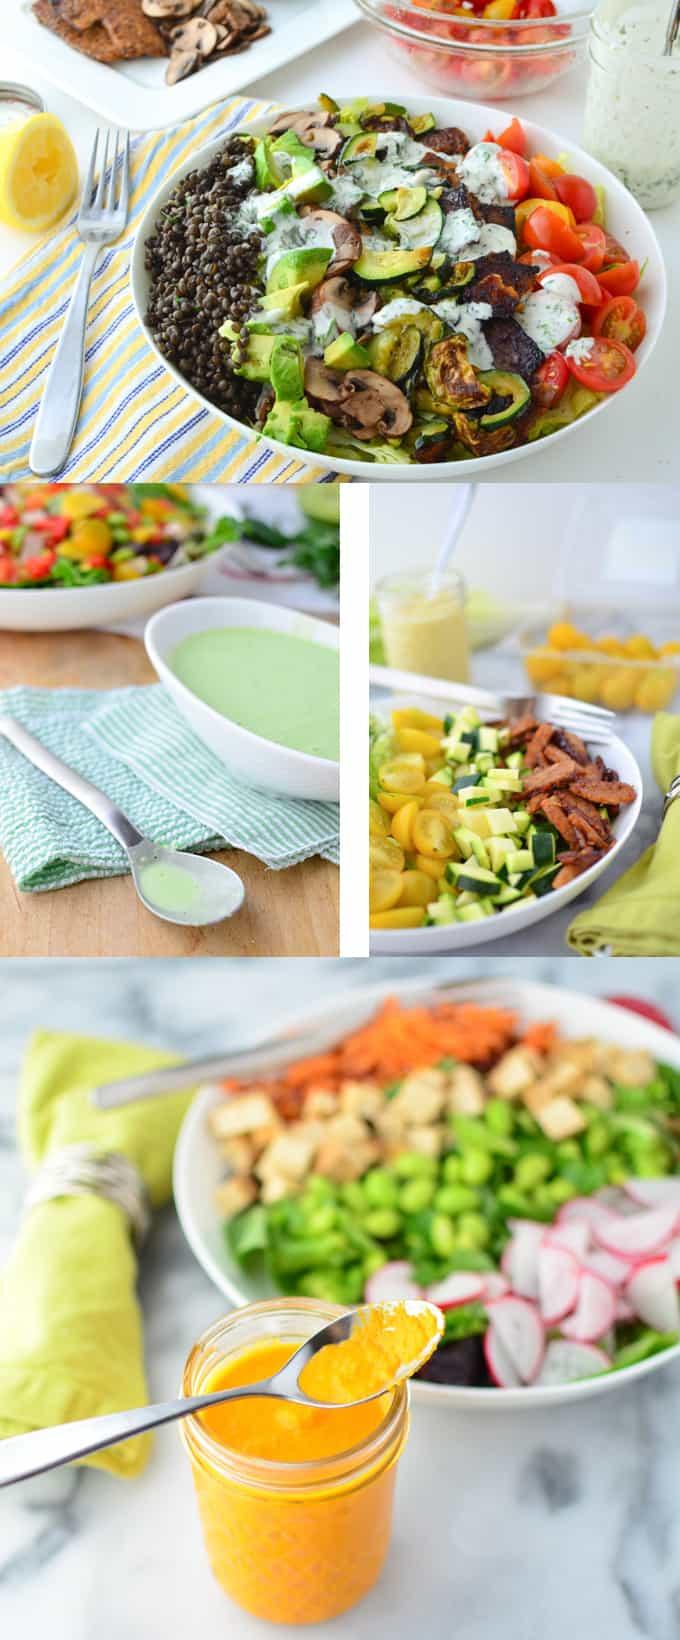 Low Fat Salad Dressing Recipes  Low Fat Salad Dressings Wild Anal